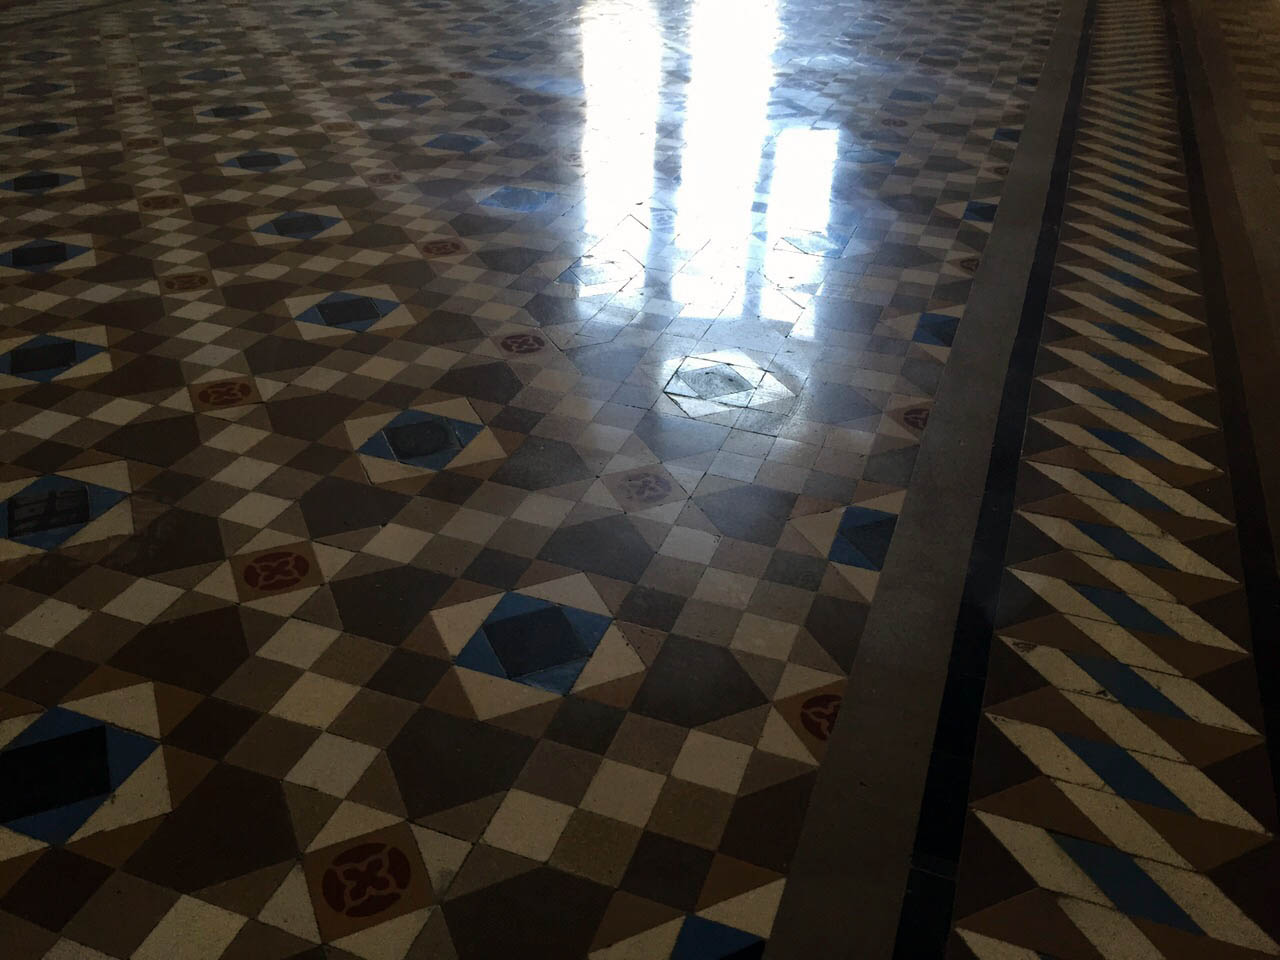 MosaicosBarcelona |Abrillabntado de mosaico nolla Barcelona